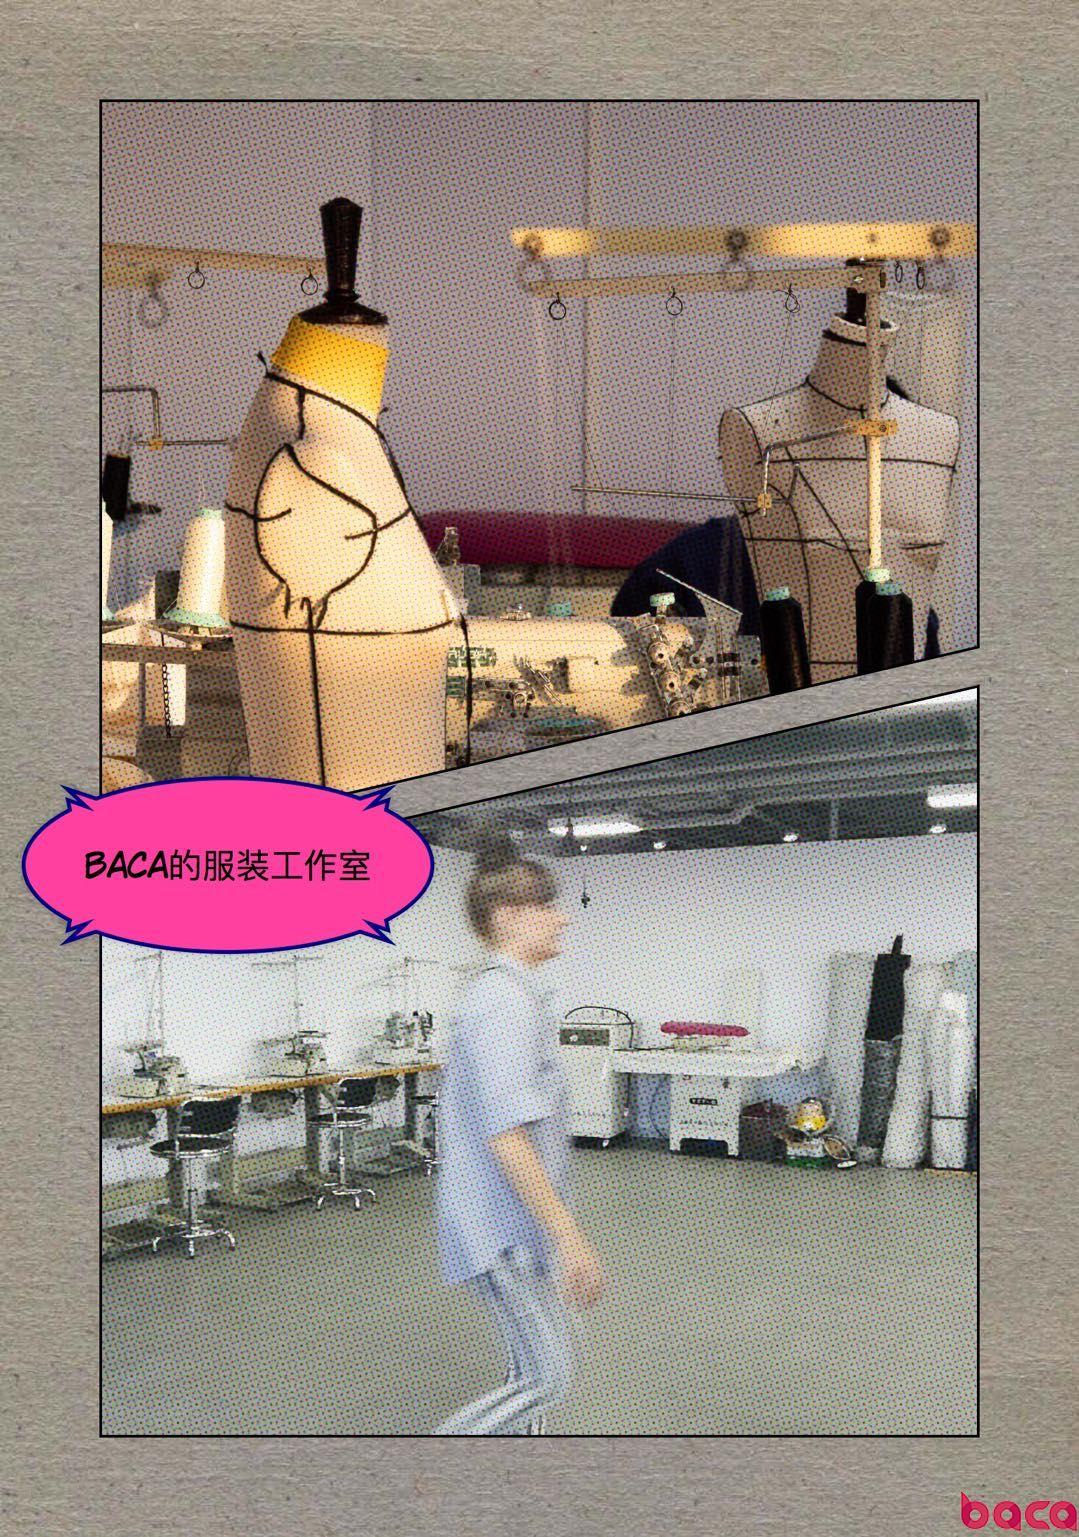 BACA时尚工作室 北京艺术设计预科